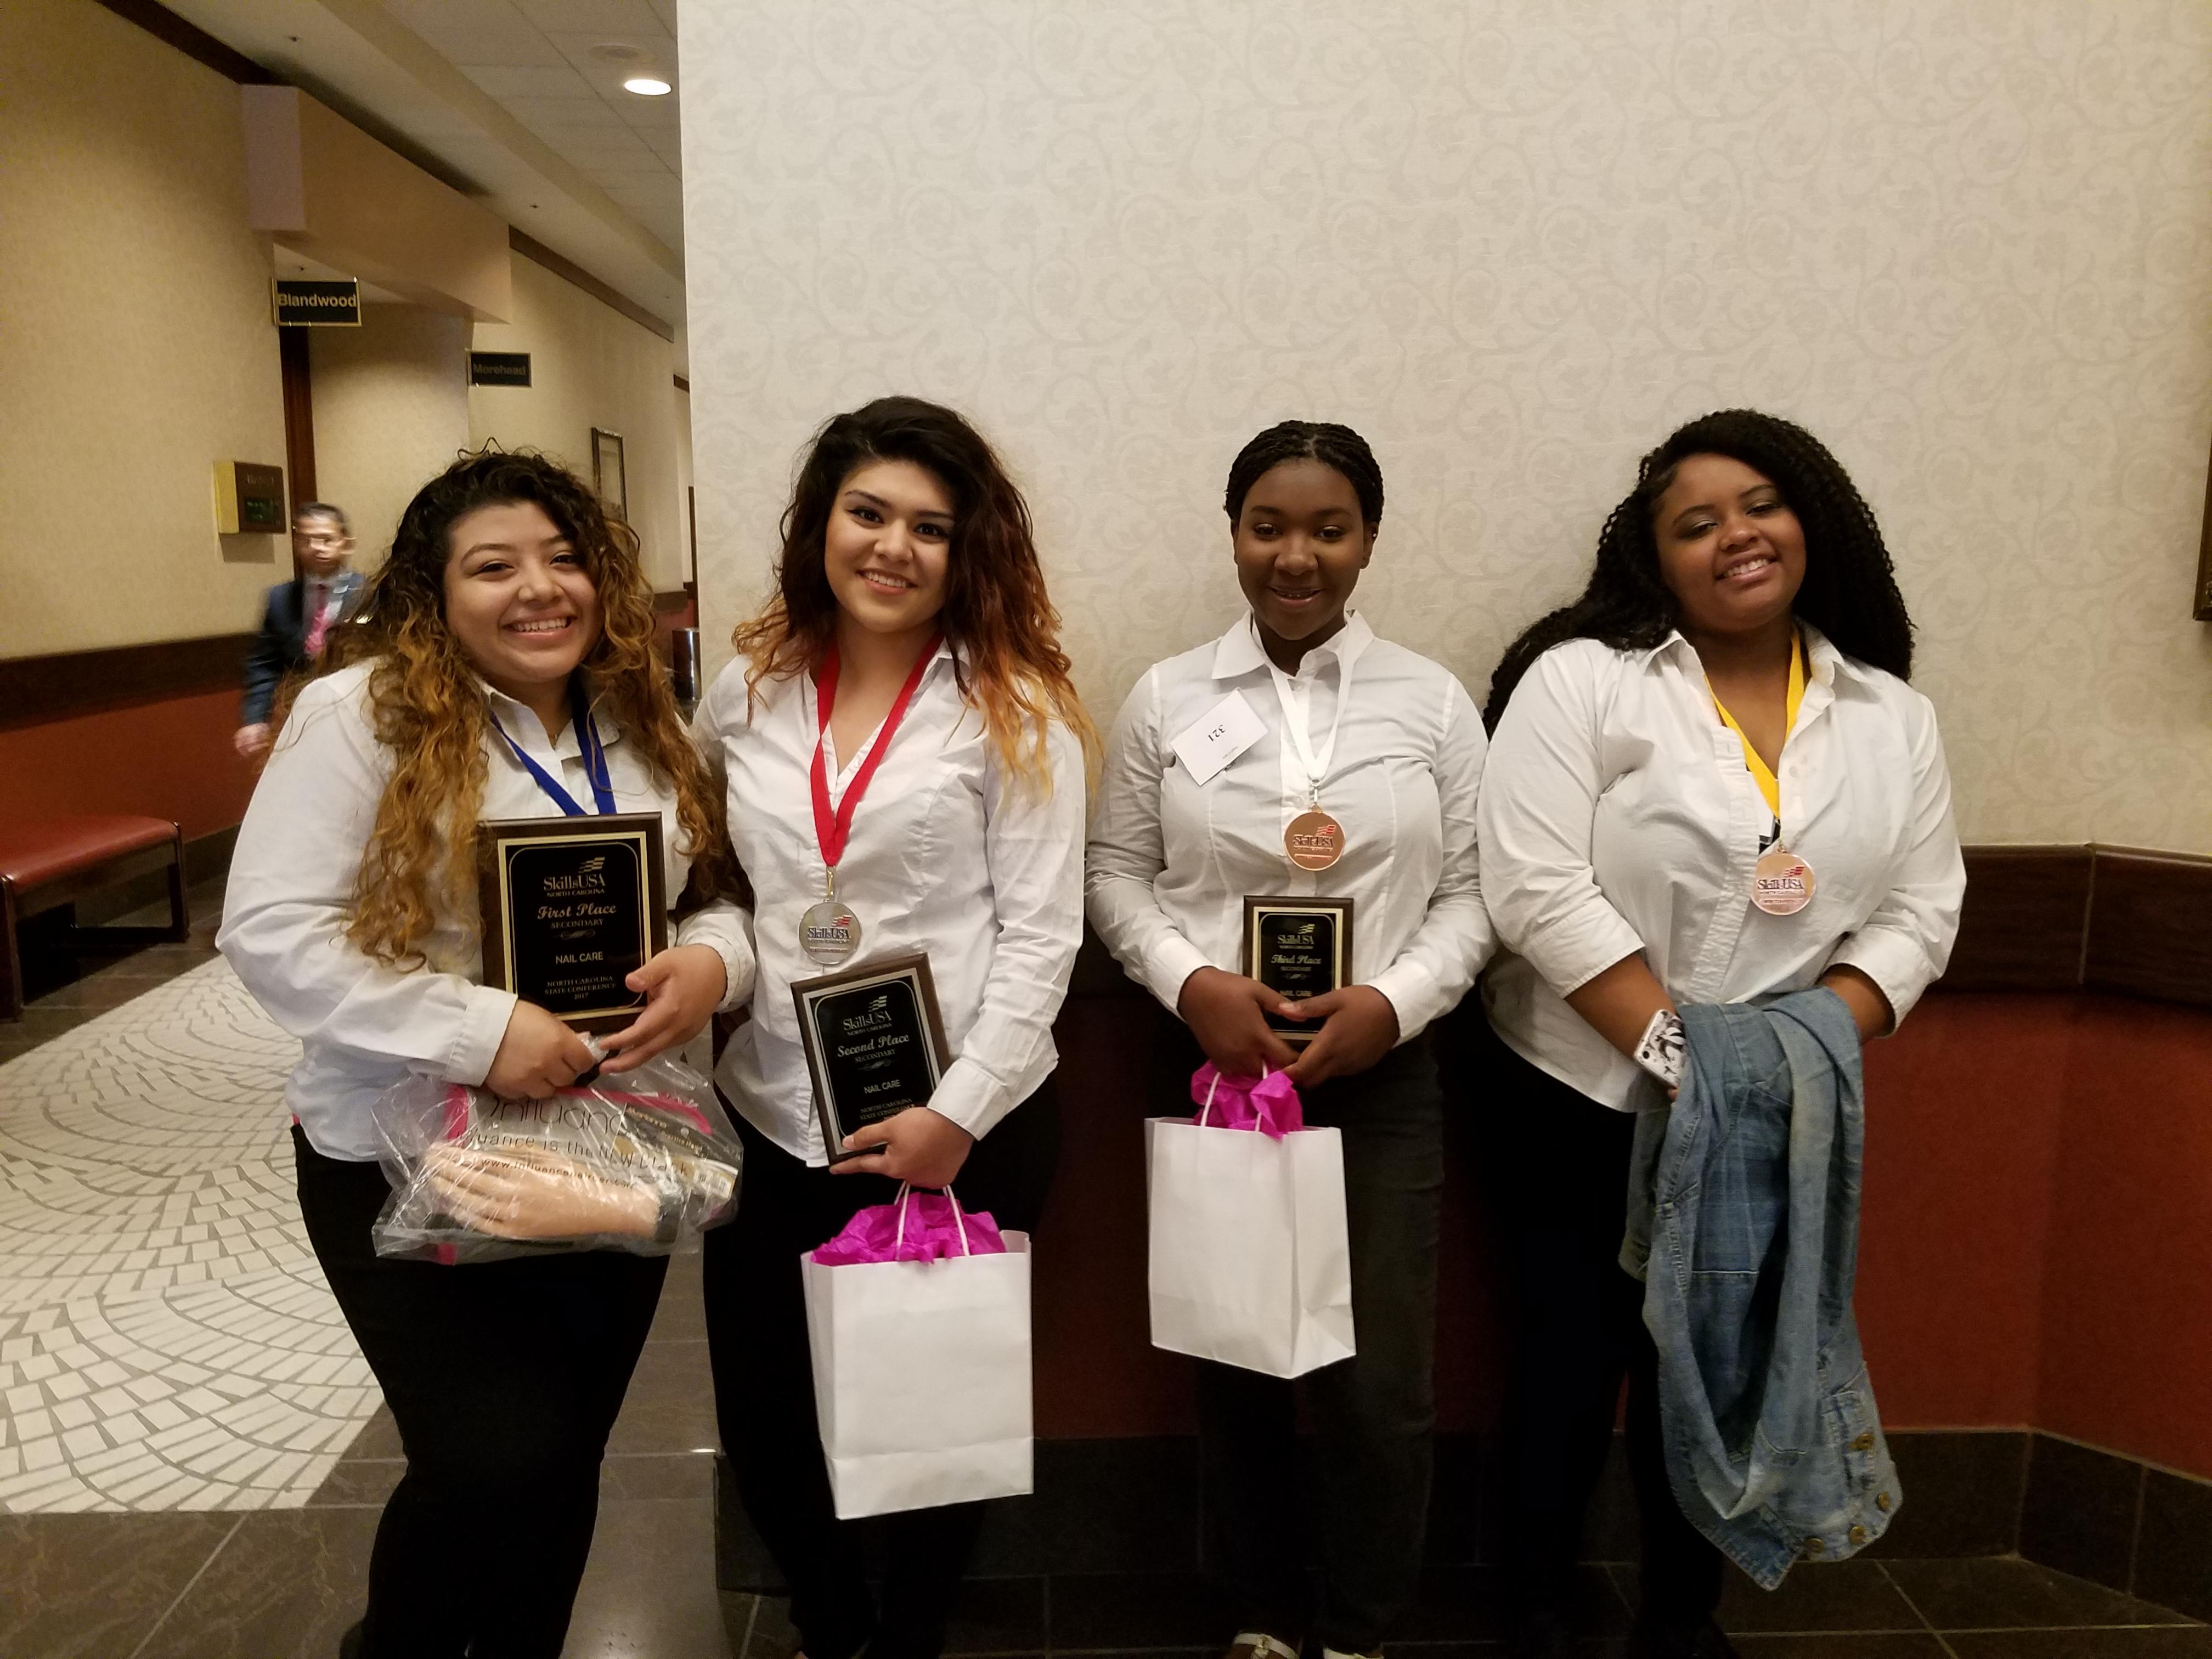 Nail care winners Jacquline Castaneda, Briceida Garcia, Leondria Turner, and Ayonna Miller